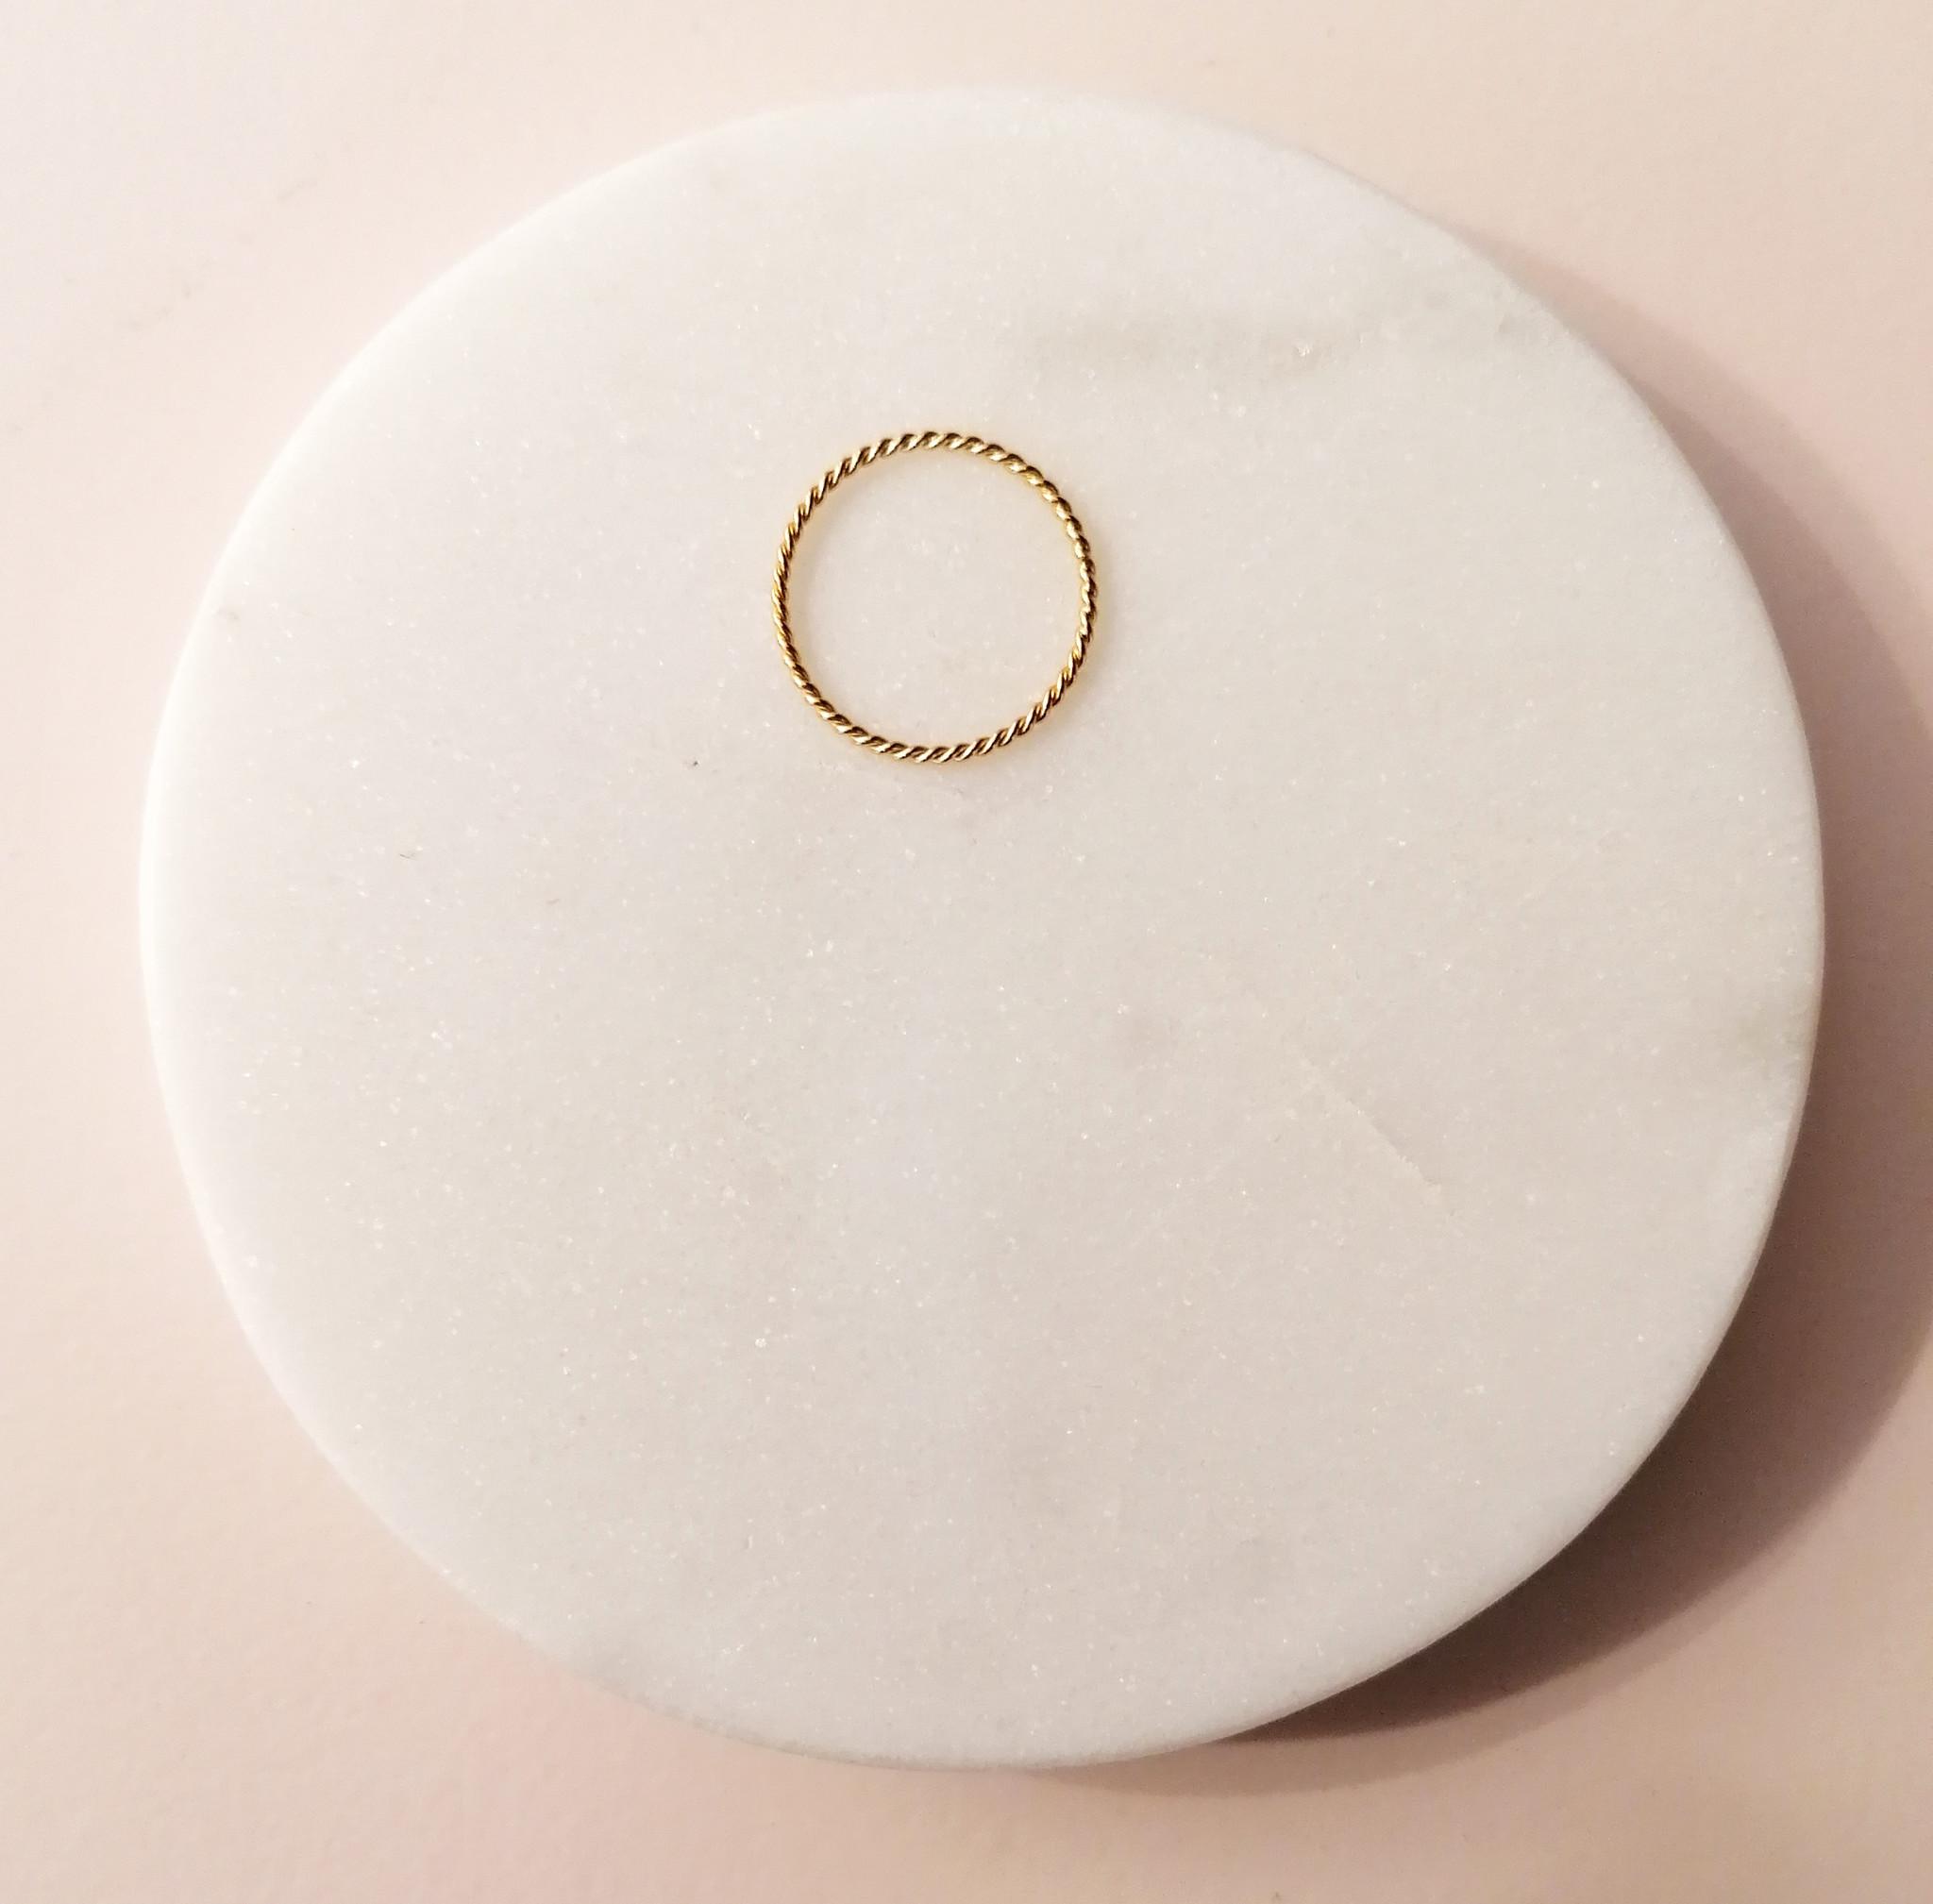 Fein geflochtener Ring aus 925er Sterling Silber - Gold-2